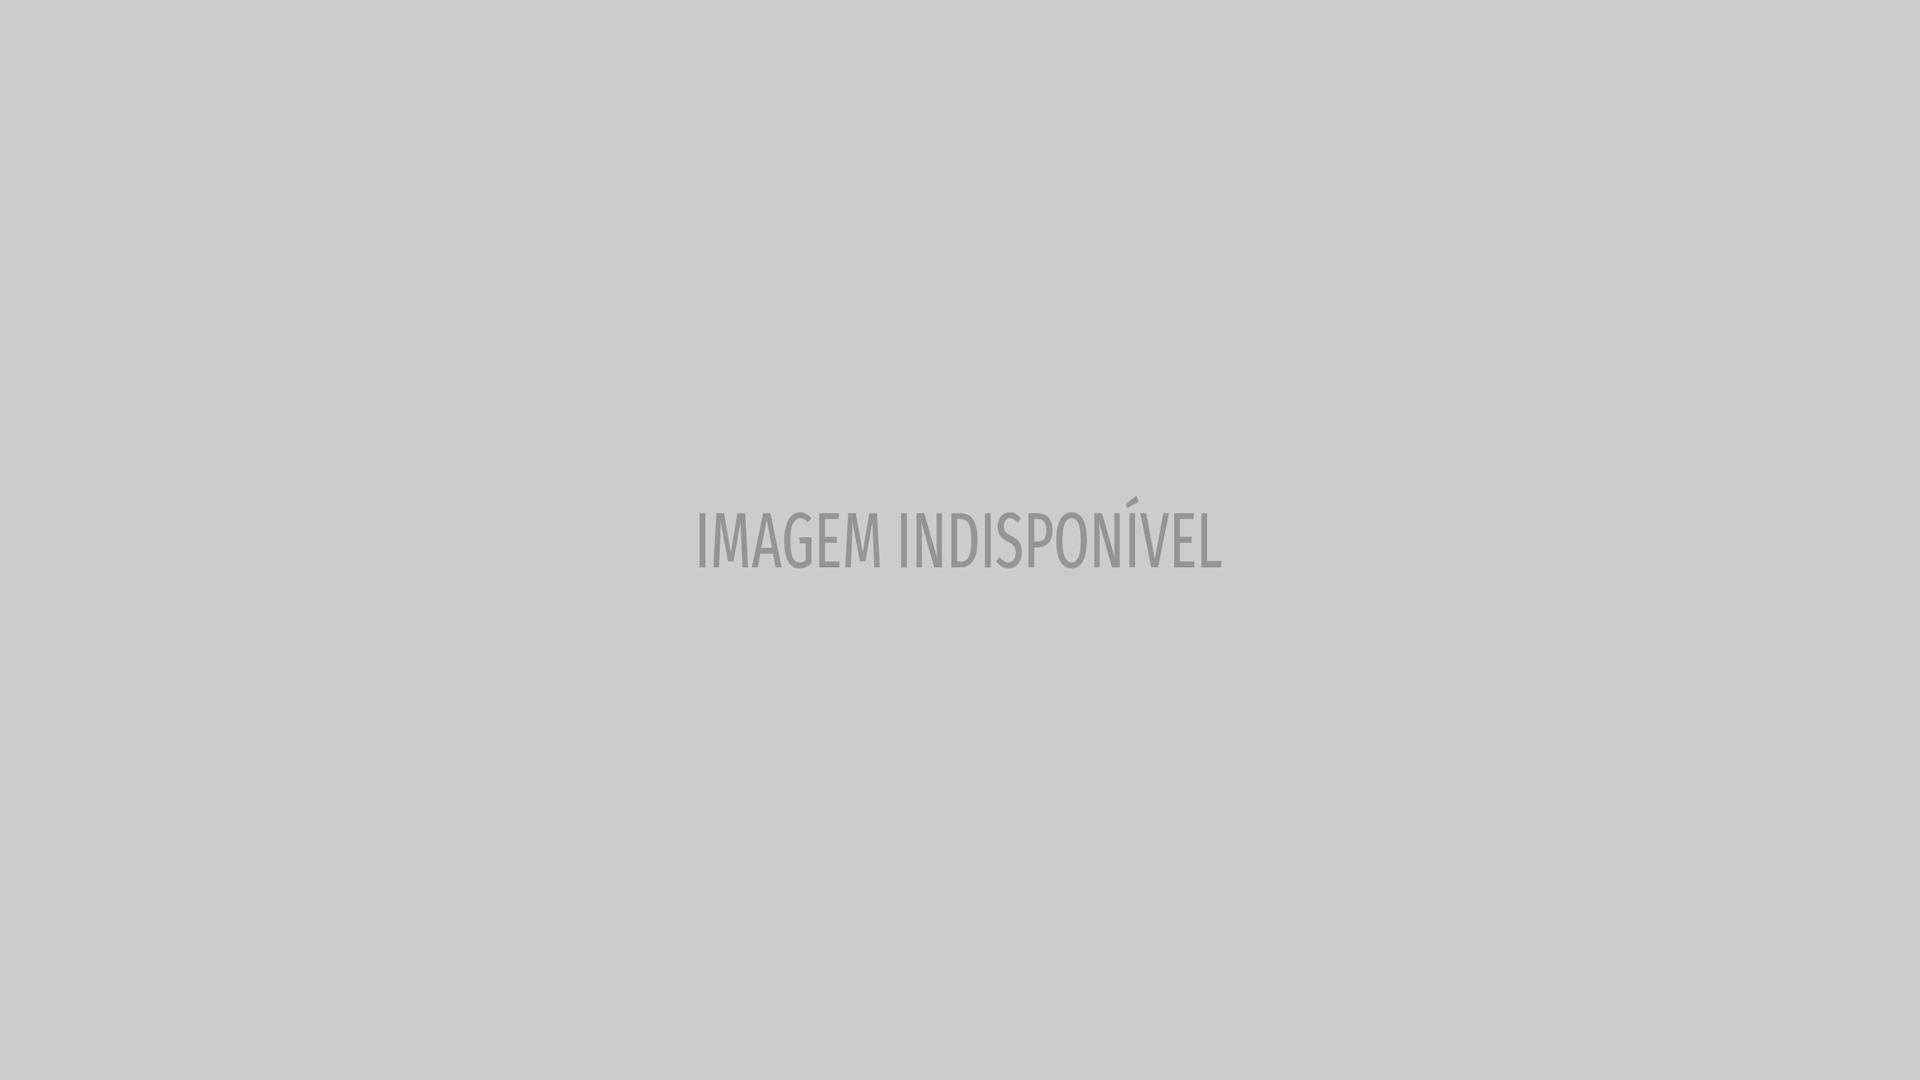 Lallana recorre às redes sociais e pede ajuda para descongelar... os pés